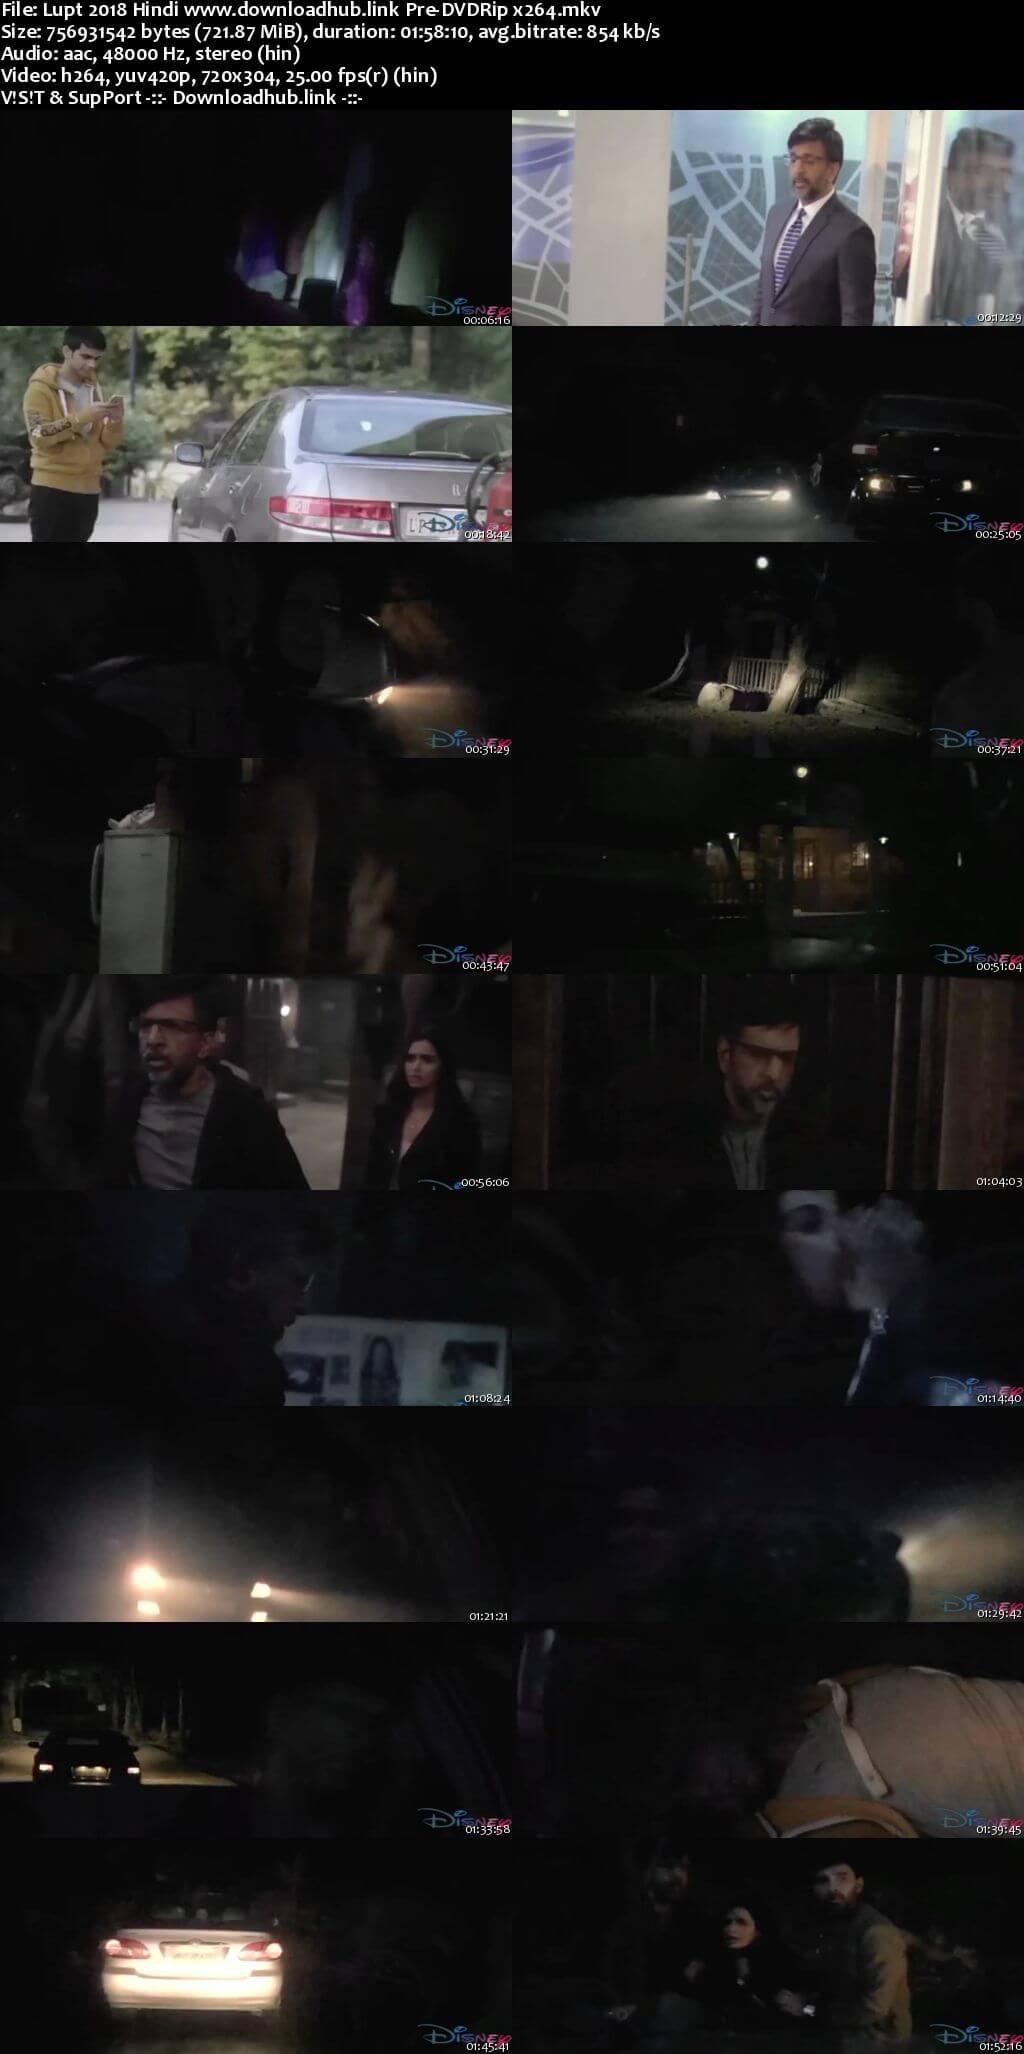 Lupt 2018 Hindi 700MB Pre-DVDRip x264